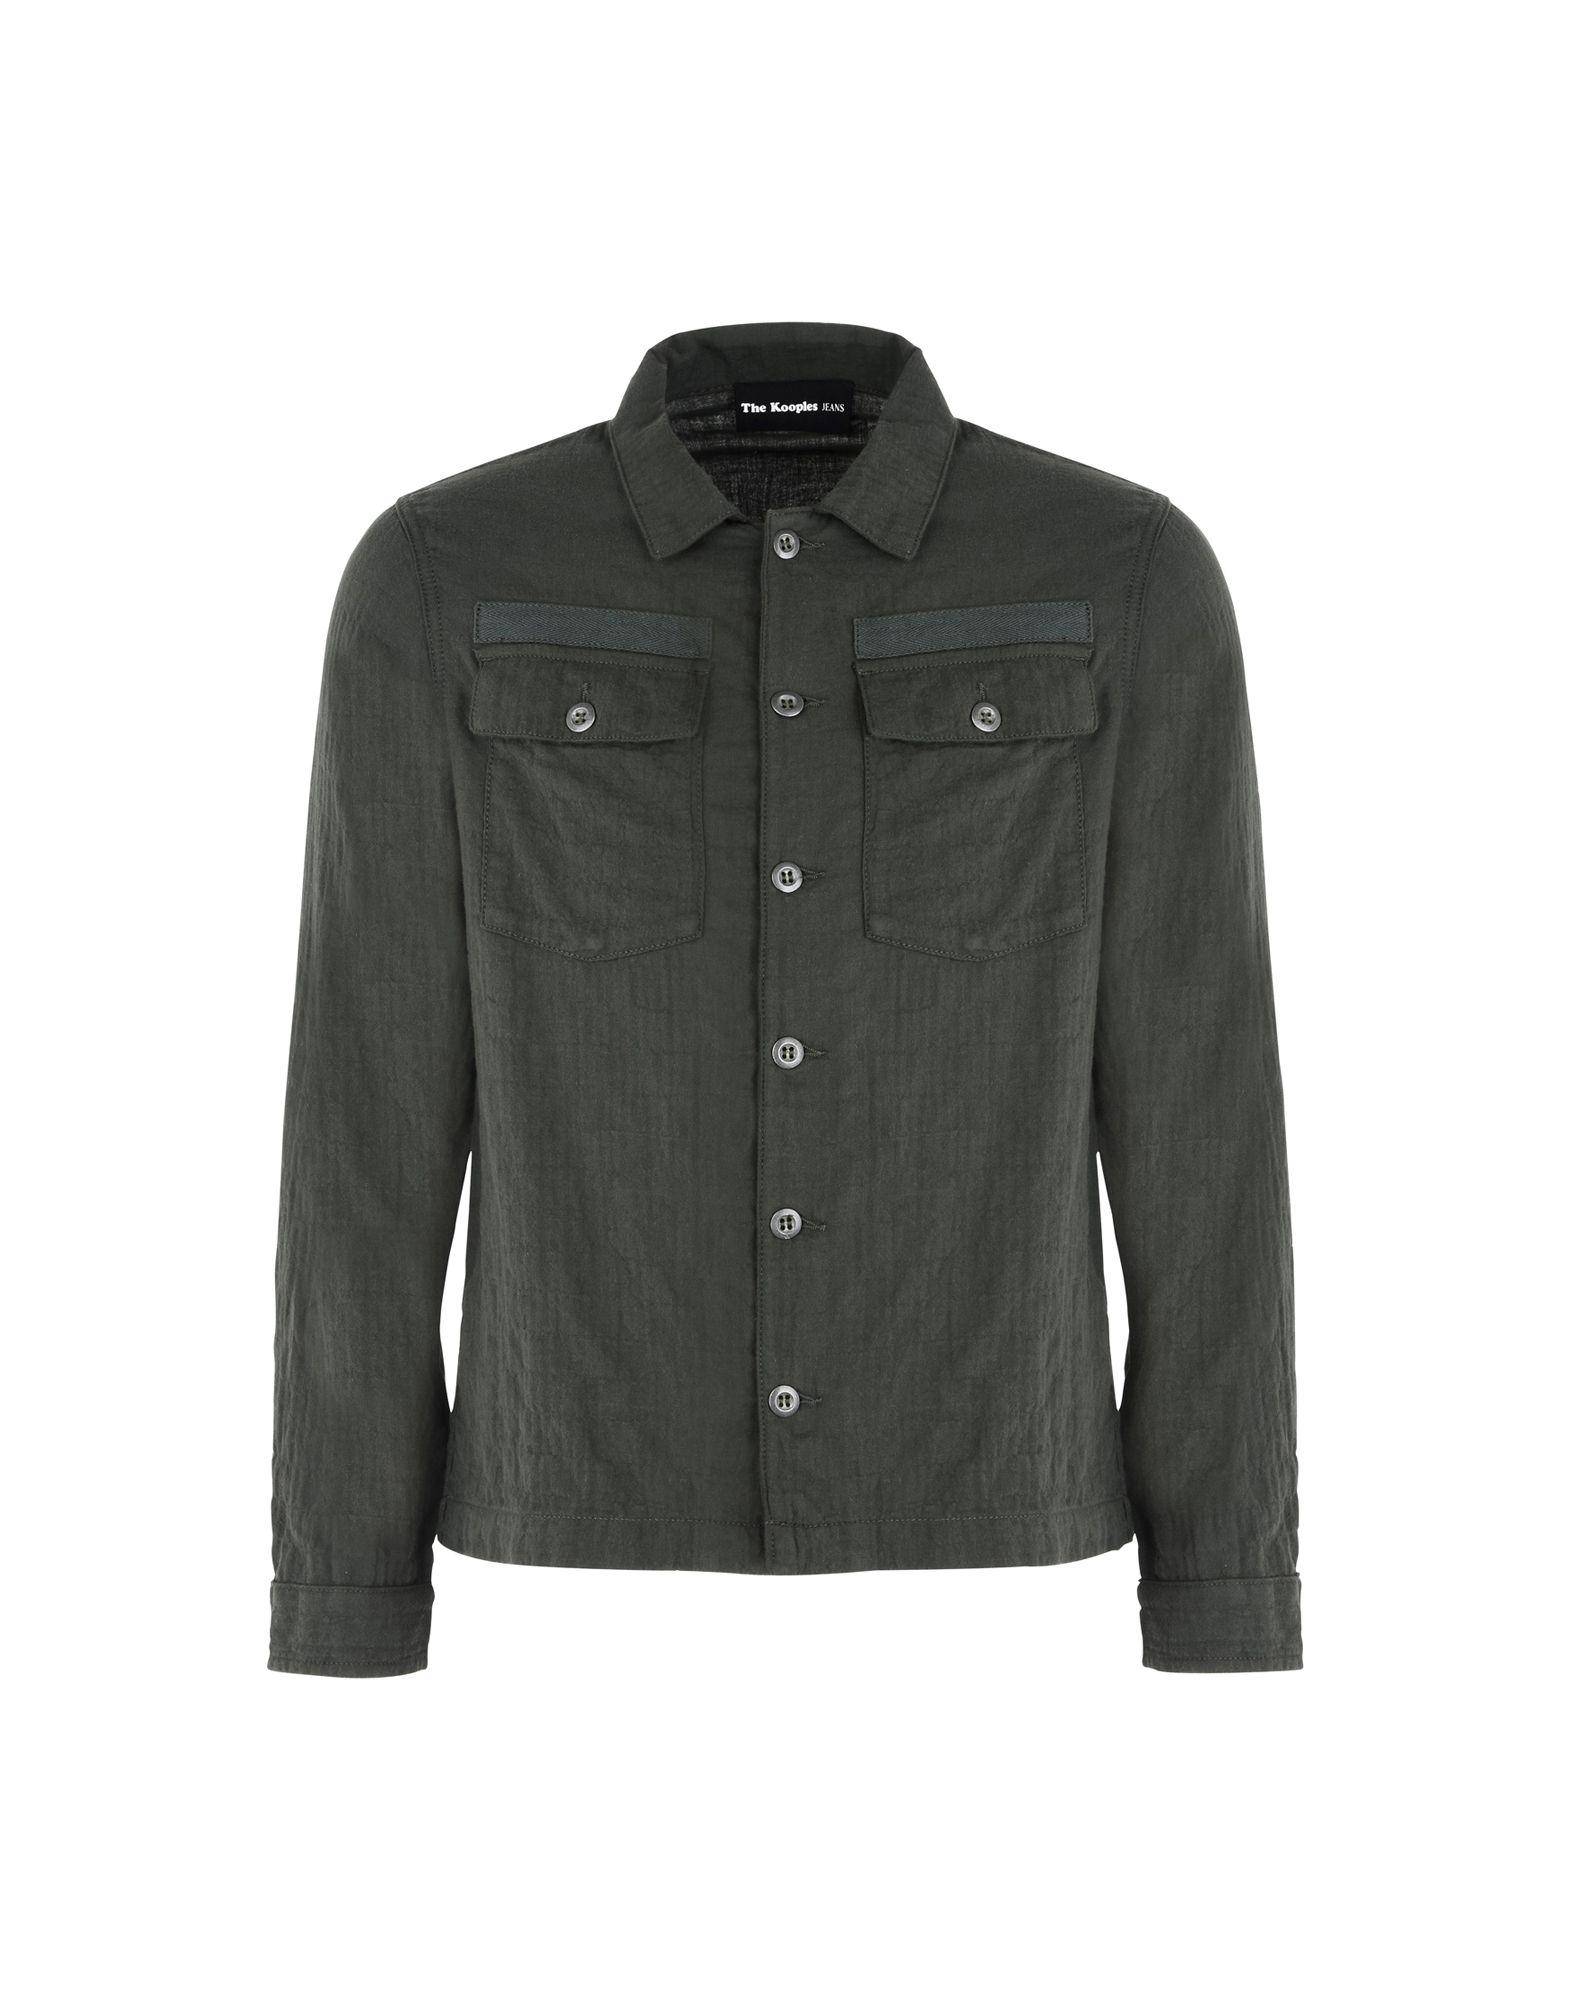 Camicia Tinta Unita The Kooples Embroidered Army Short - Uomo - Acquista online su